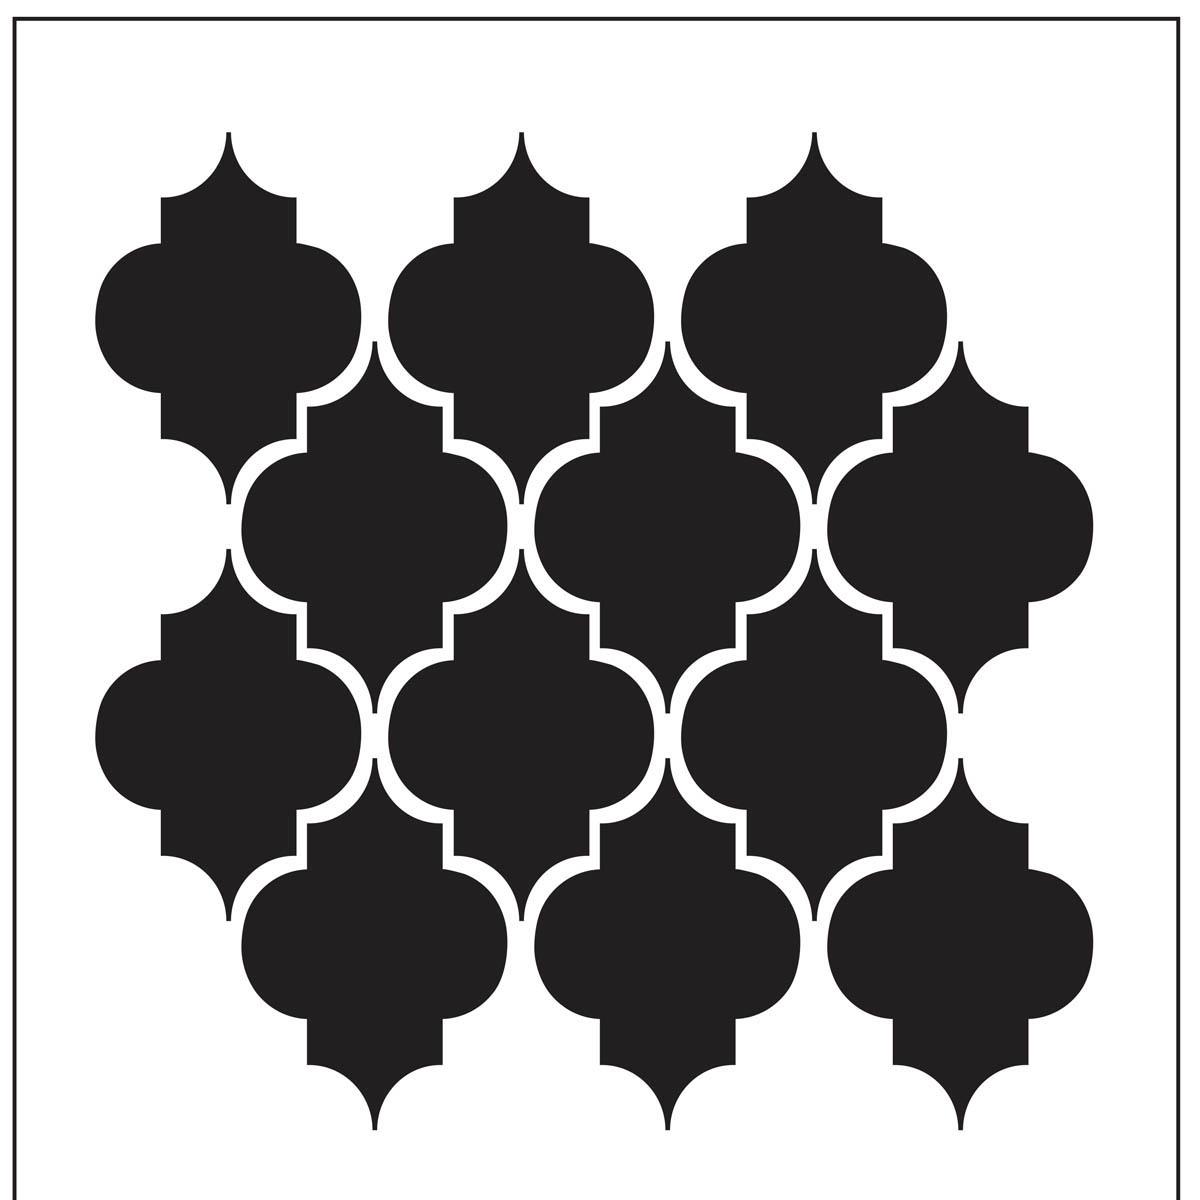 FolkArt ® Home Decor™ Wall Stencils - Trellis